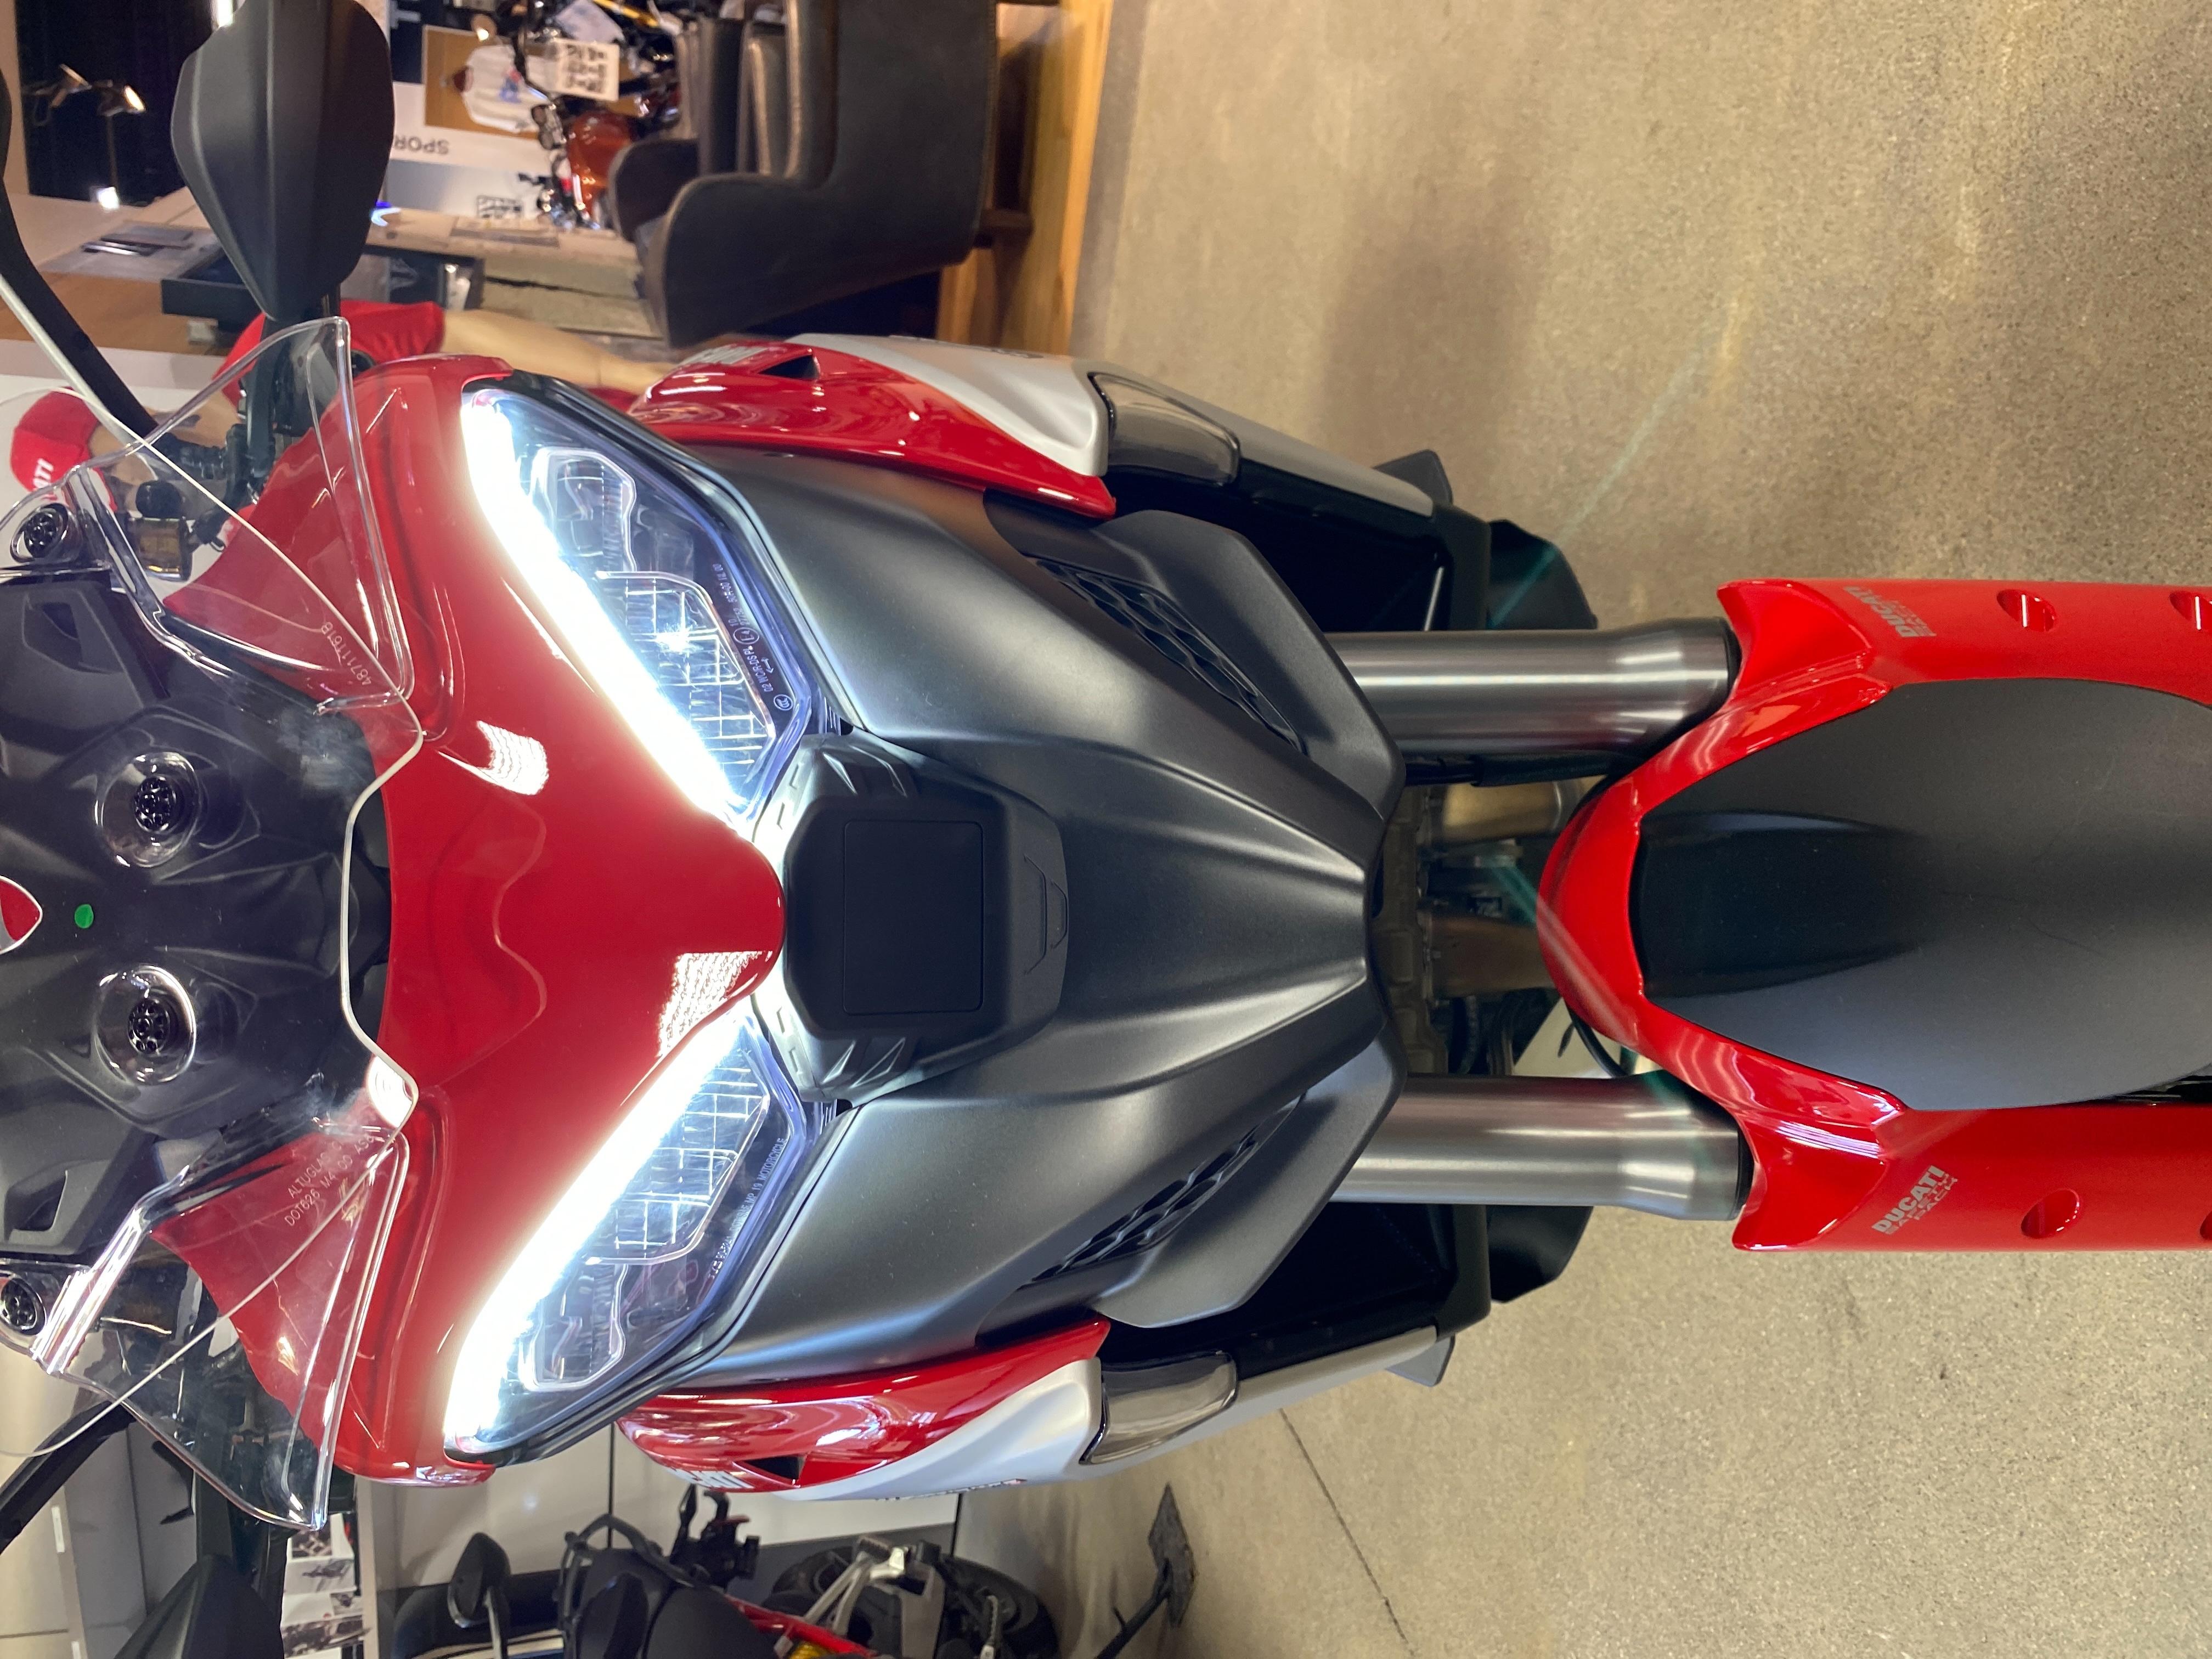 2022 Ducati MULTISTRADA V4S at Frontline Eurosports